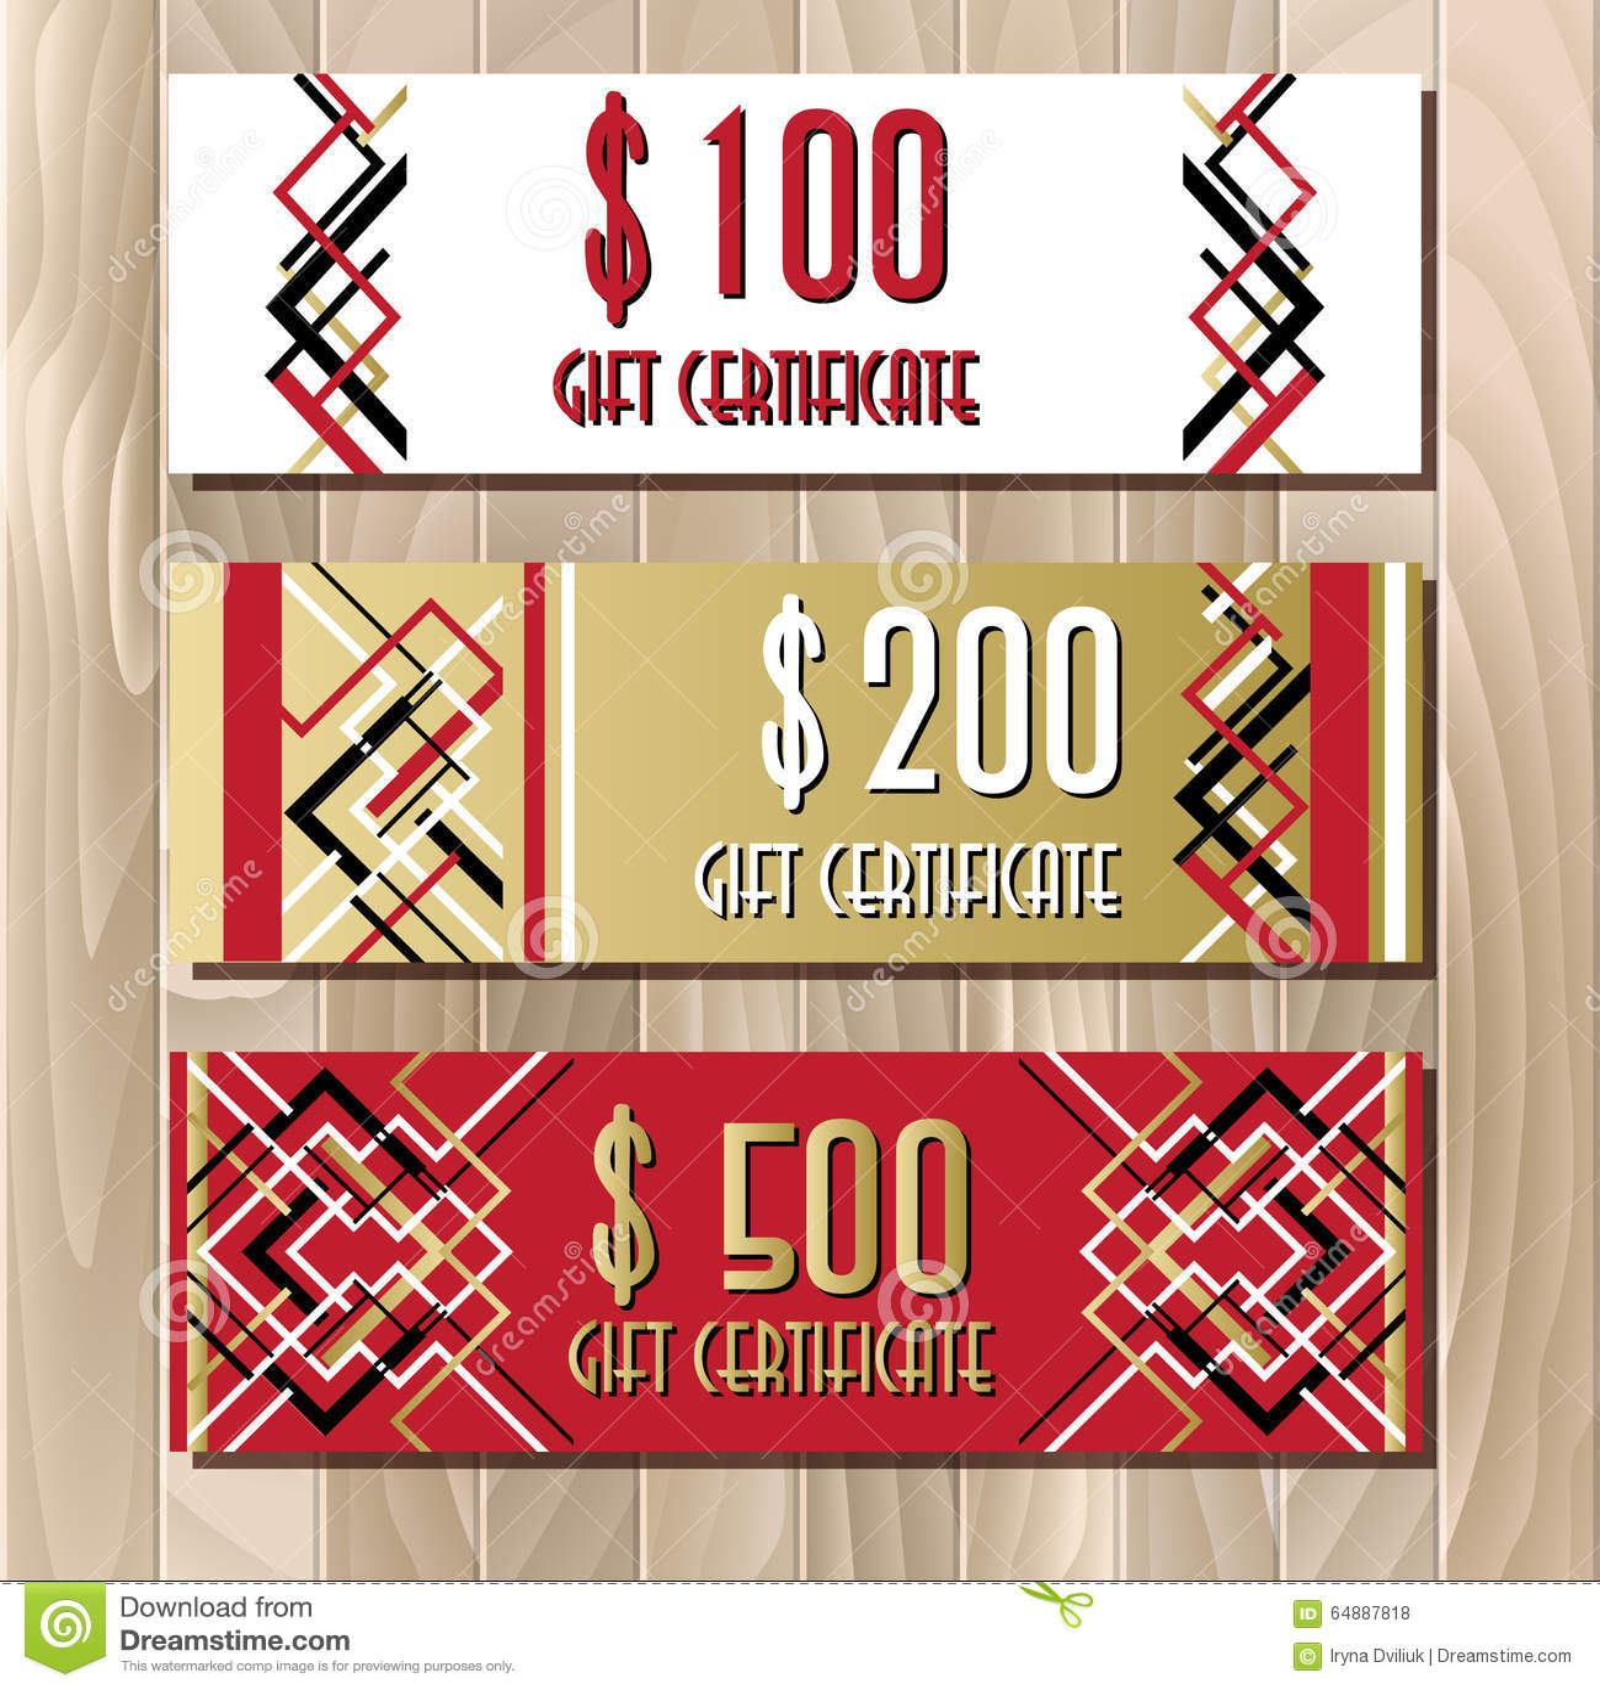 golden red gift certificate template in art deco outline style golden red gift certificate template in art deco outline style